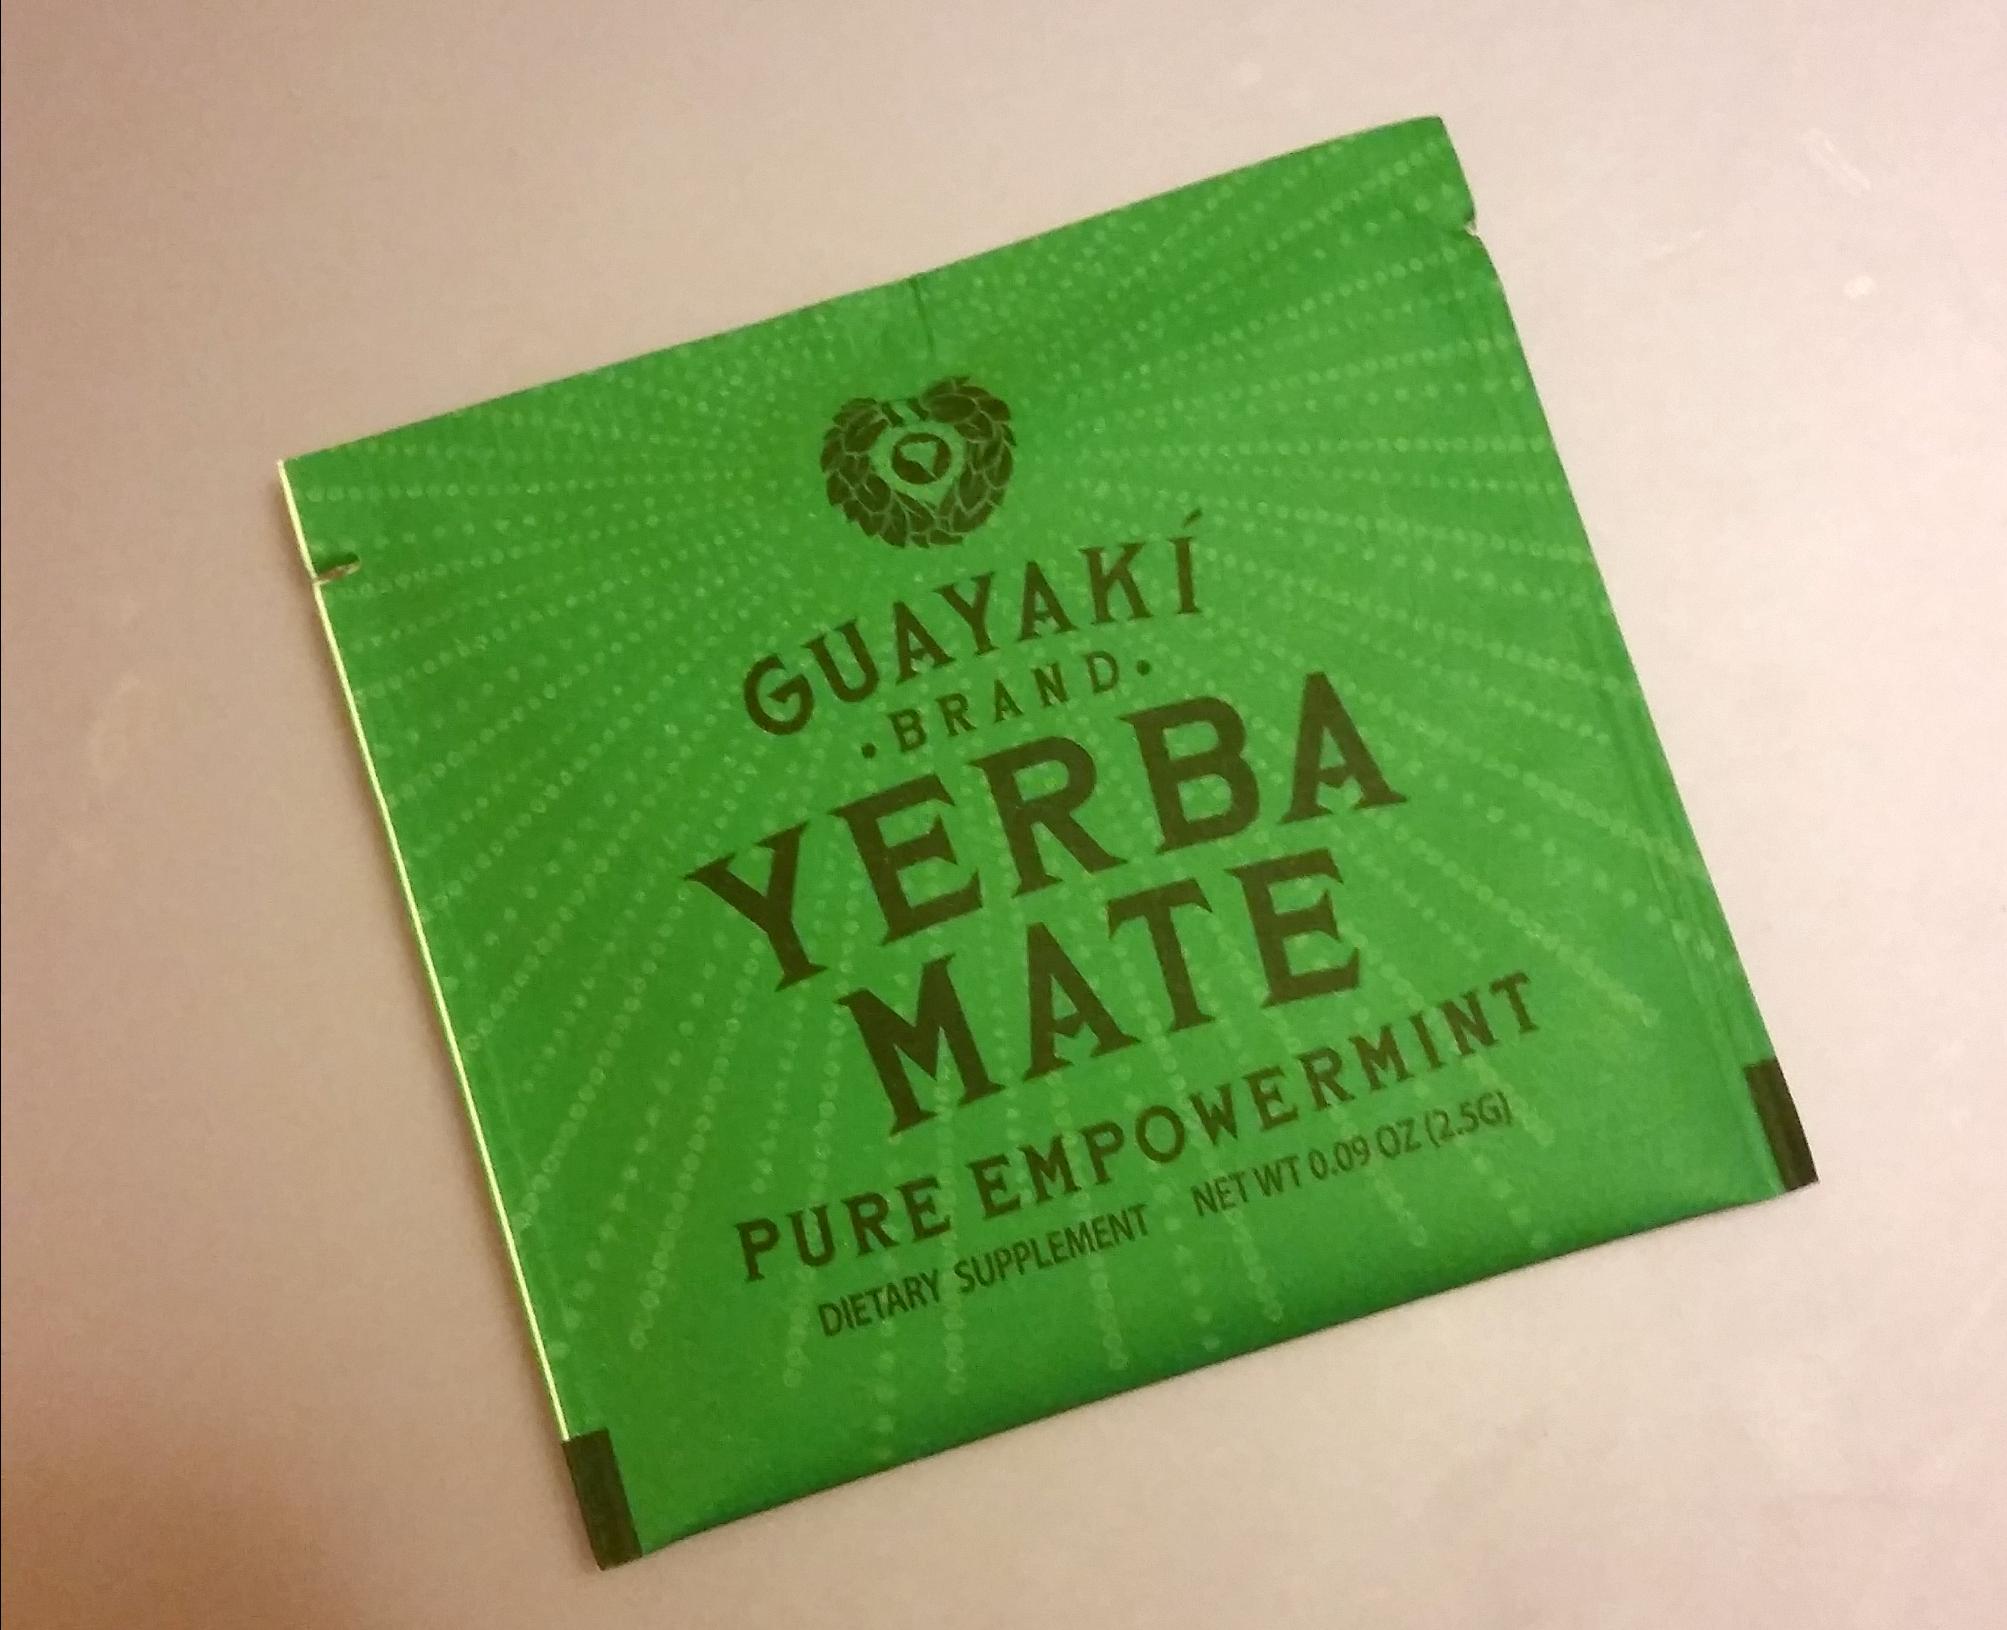 Image of Empowermint Tea Bag from Yerba Mate